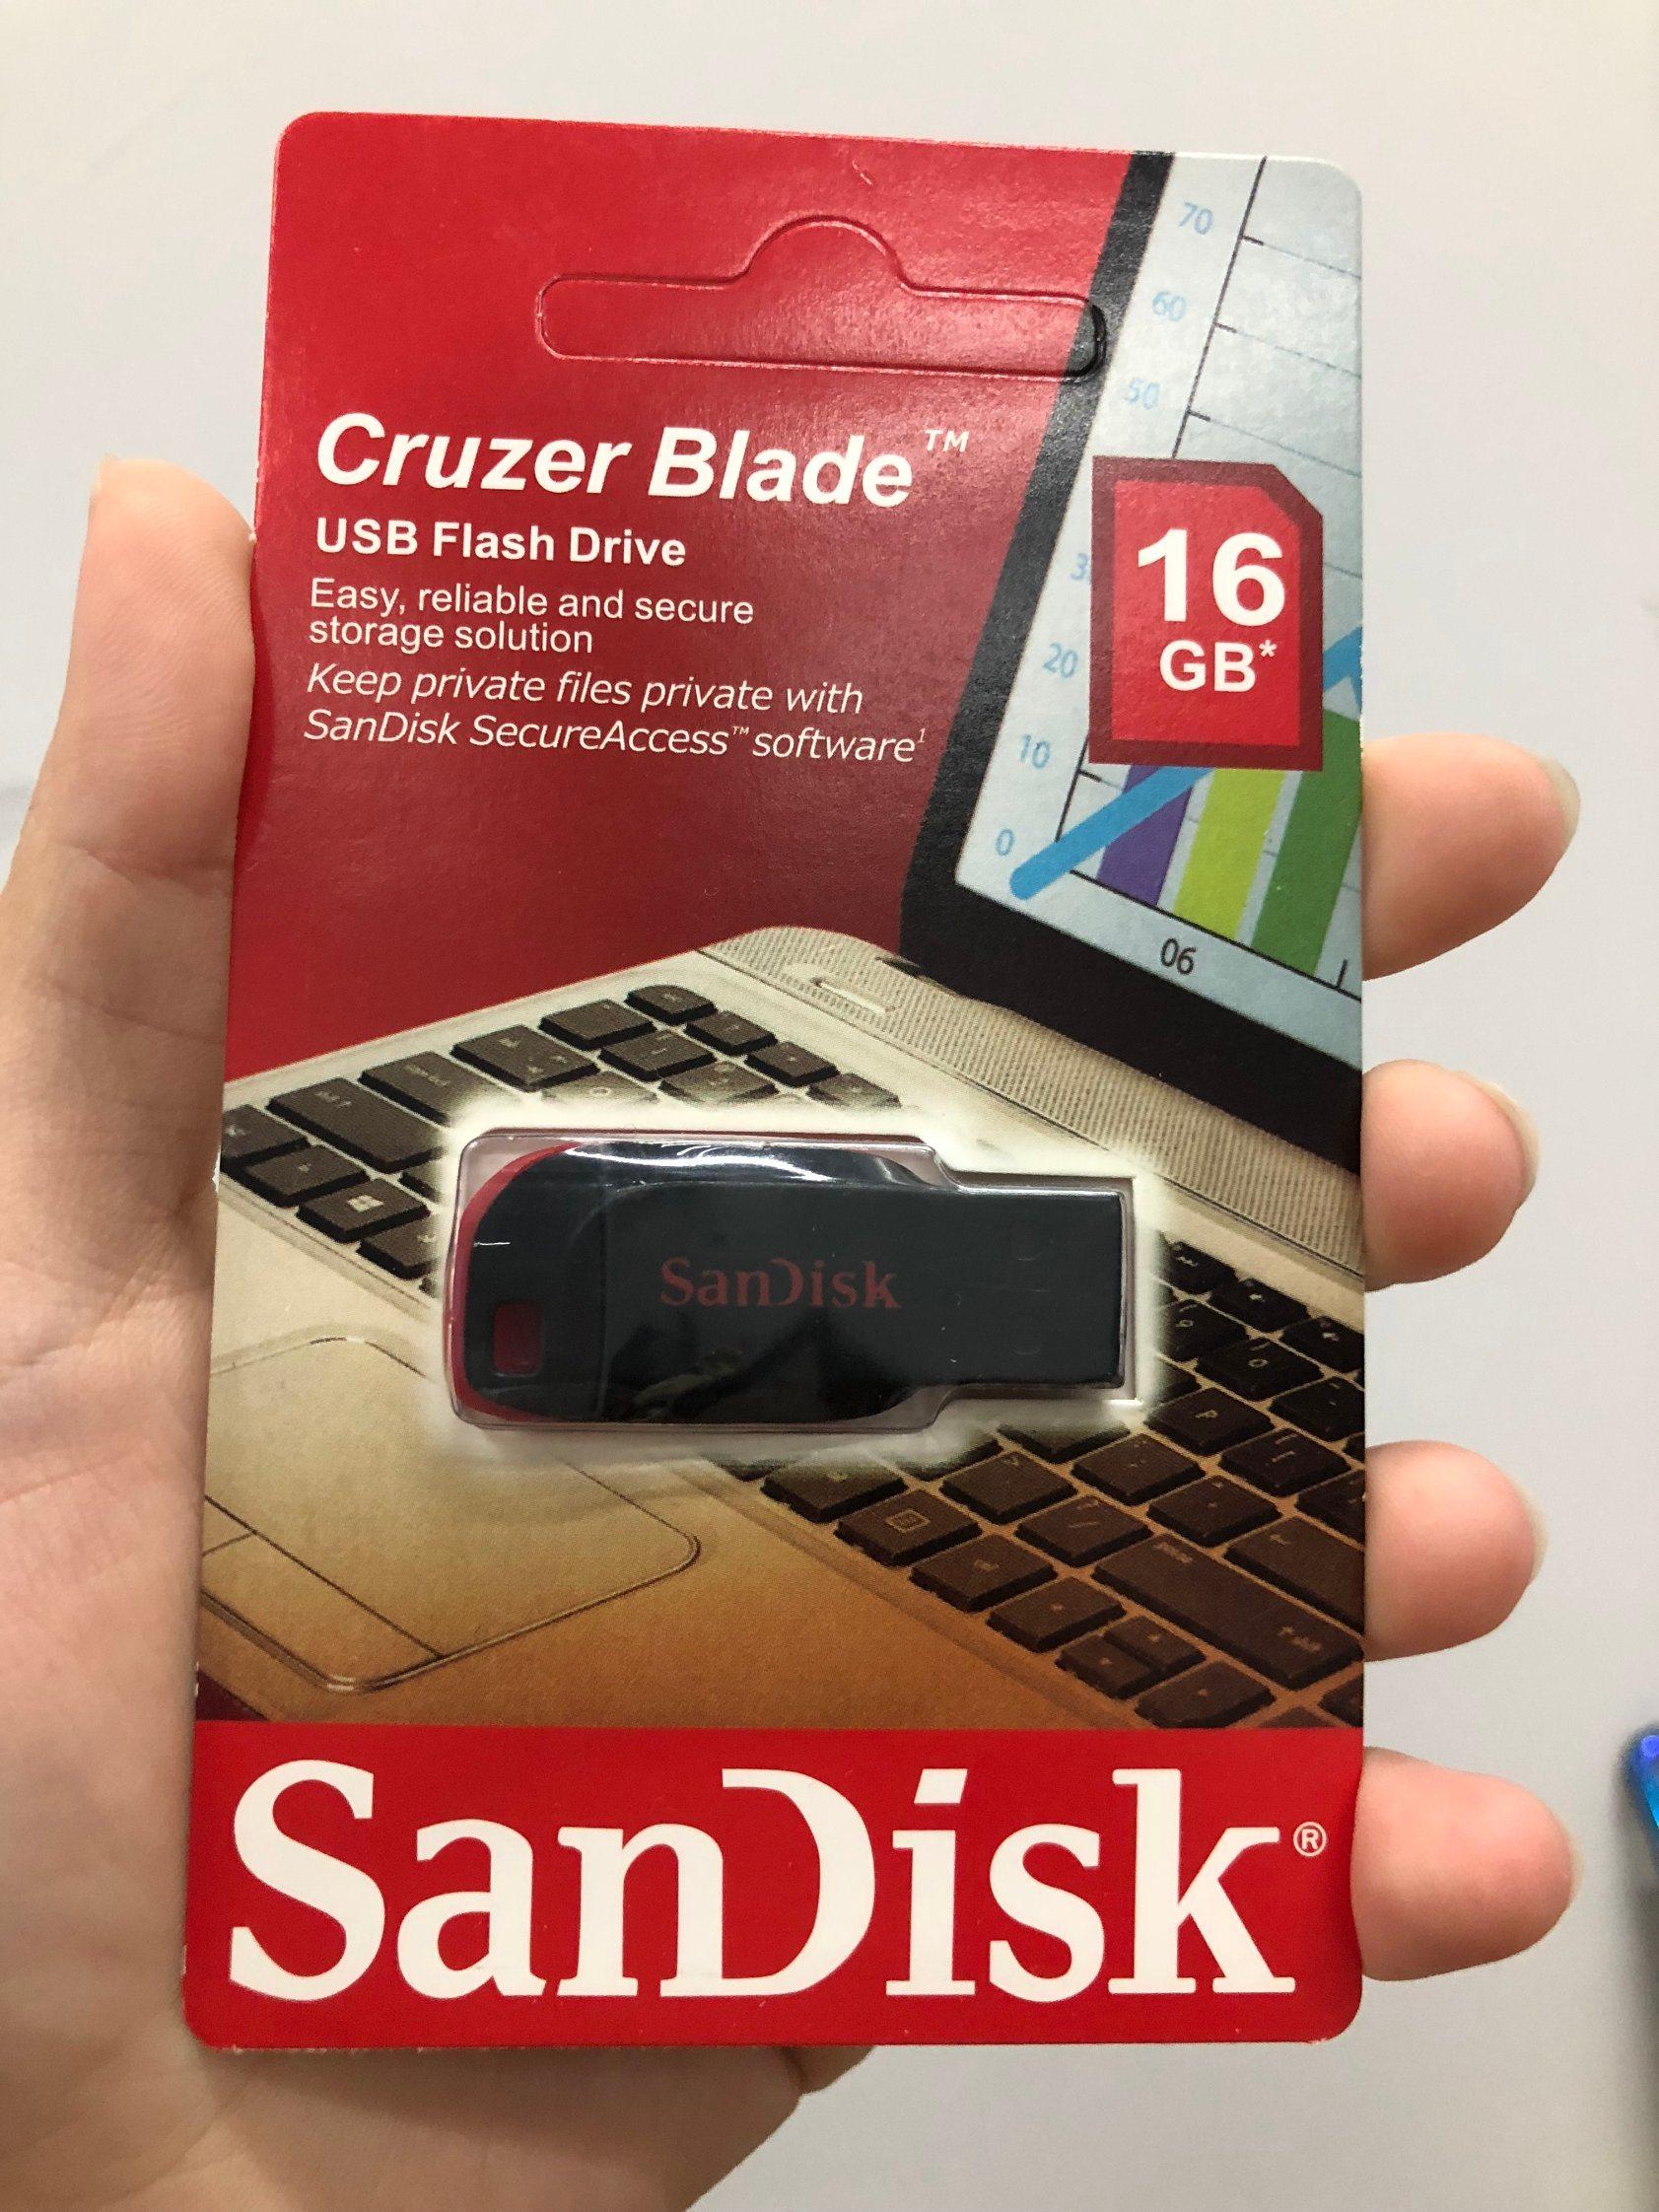 China 100 Full Capacity Original 16gb Usb Flash Drive Memory Sandisk Flashdisk 16 Gb Cruzer Blade